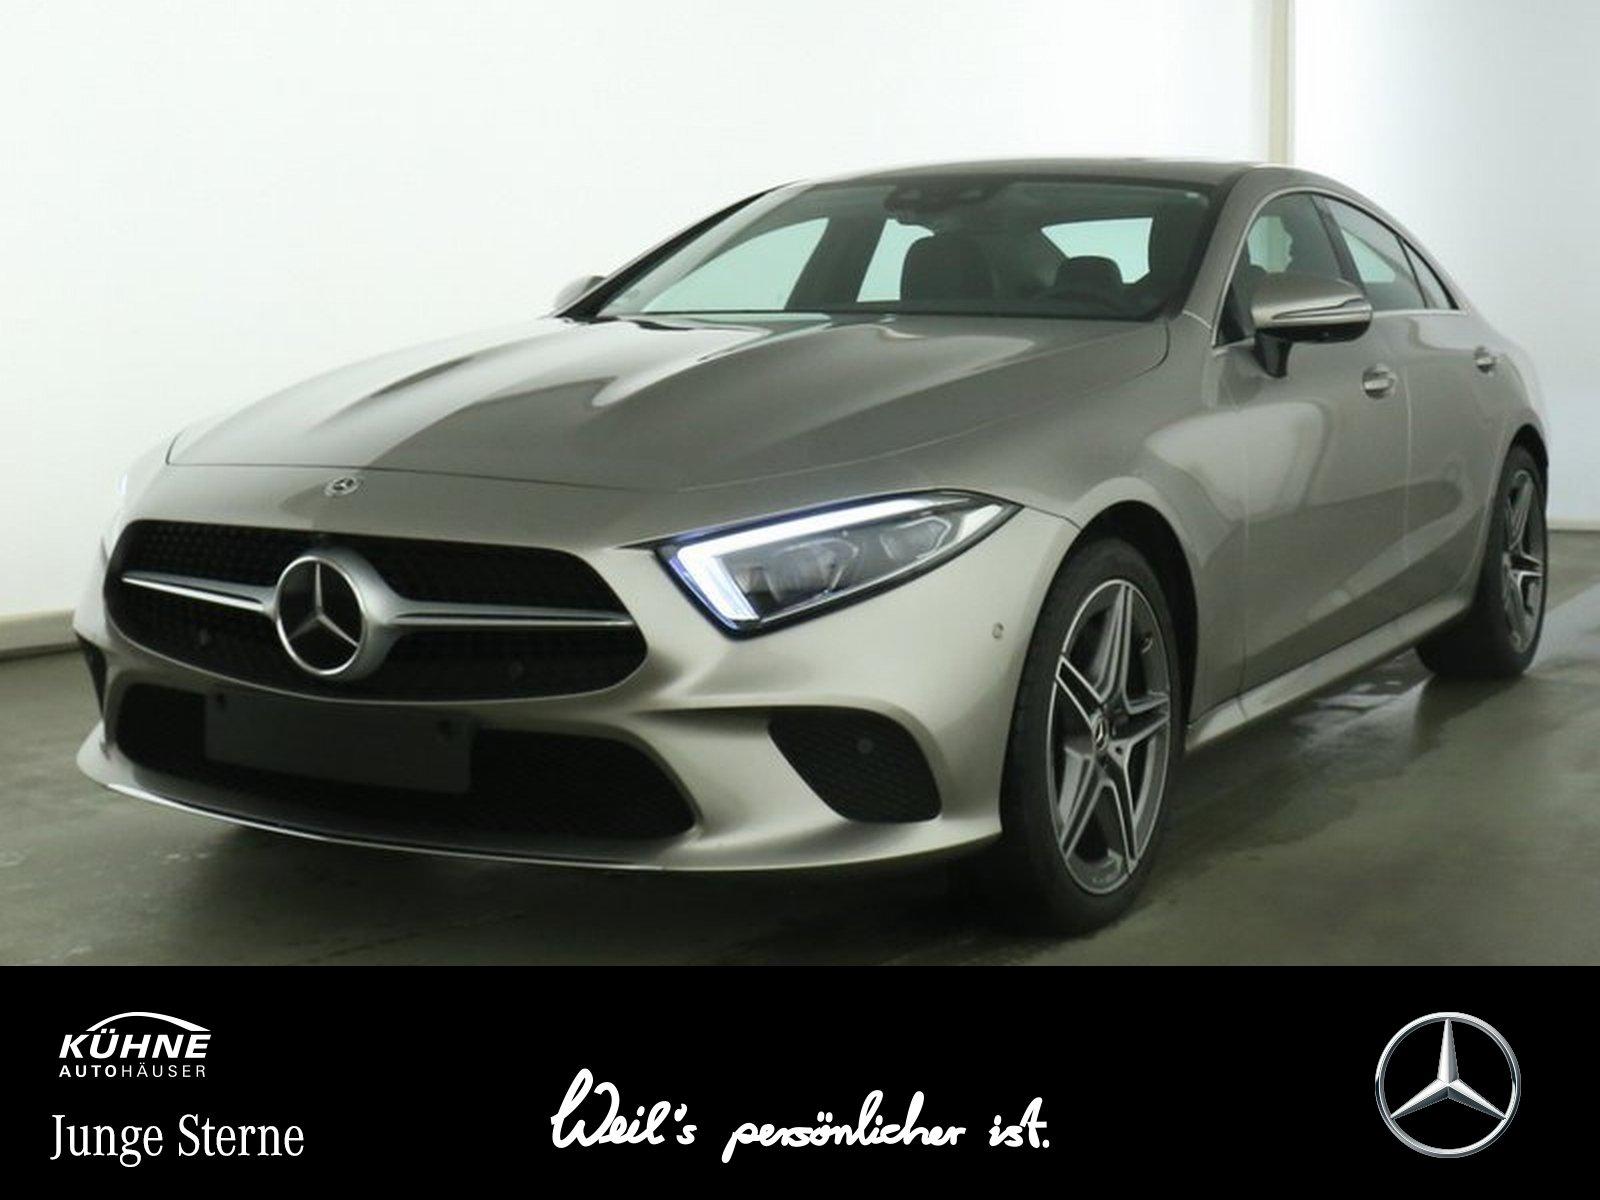 Mercedes-Benz CLS 400 d 4M+TV+Multi+Wide+360+Menory+DynamicBo, Jahr 2020, Diesel